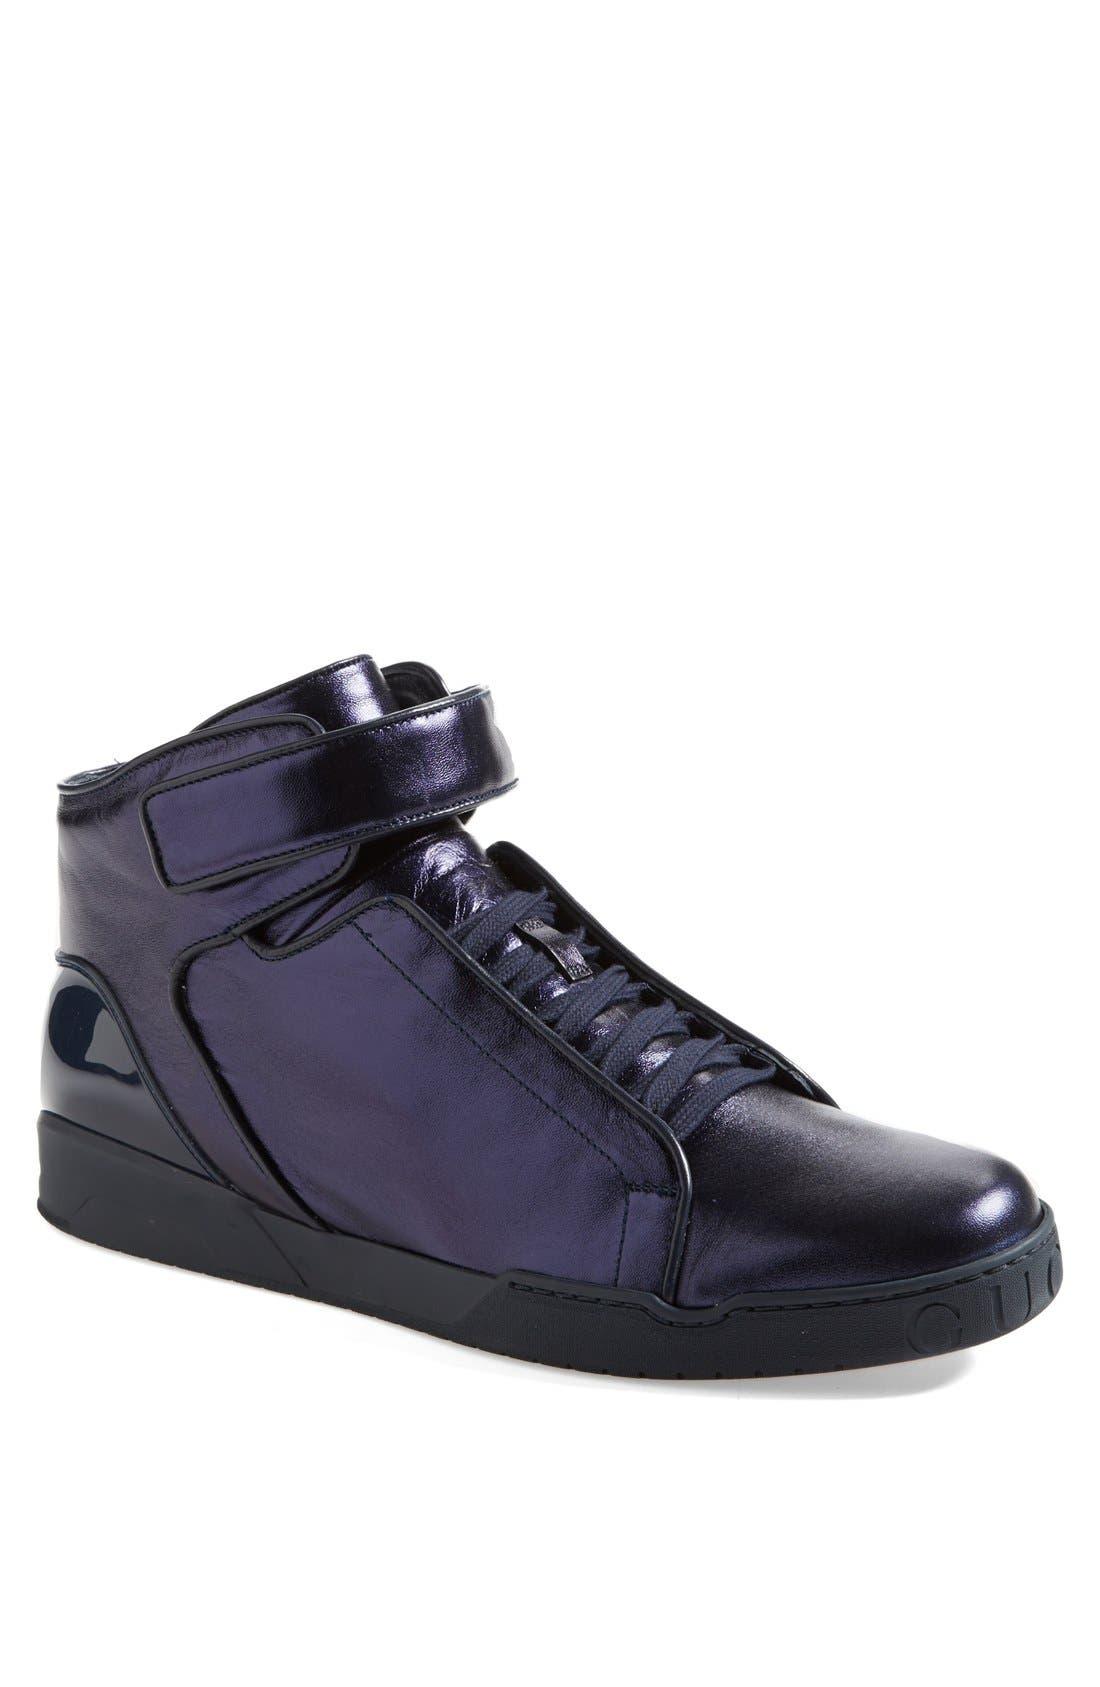 Main Image - Gucci 'Mel Mid' Metallic Sneaker